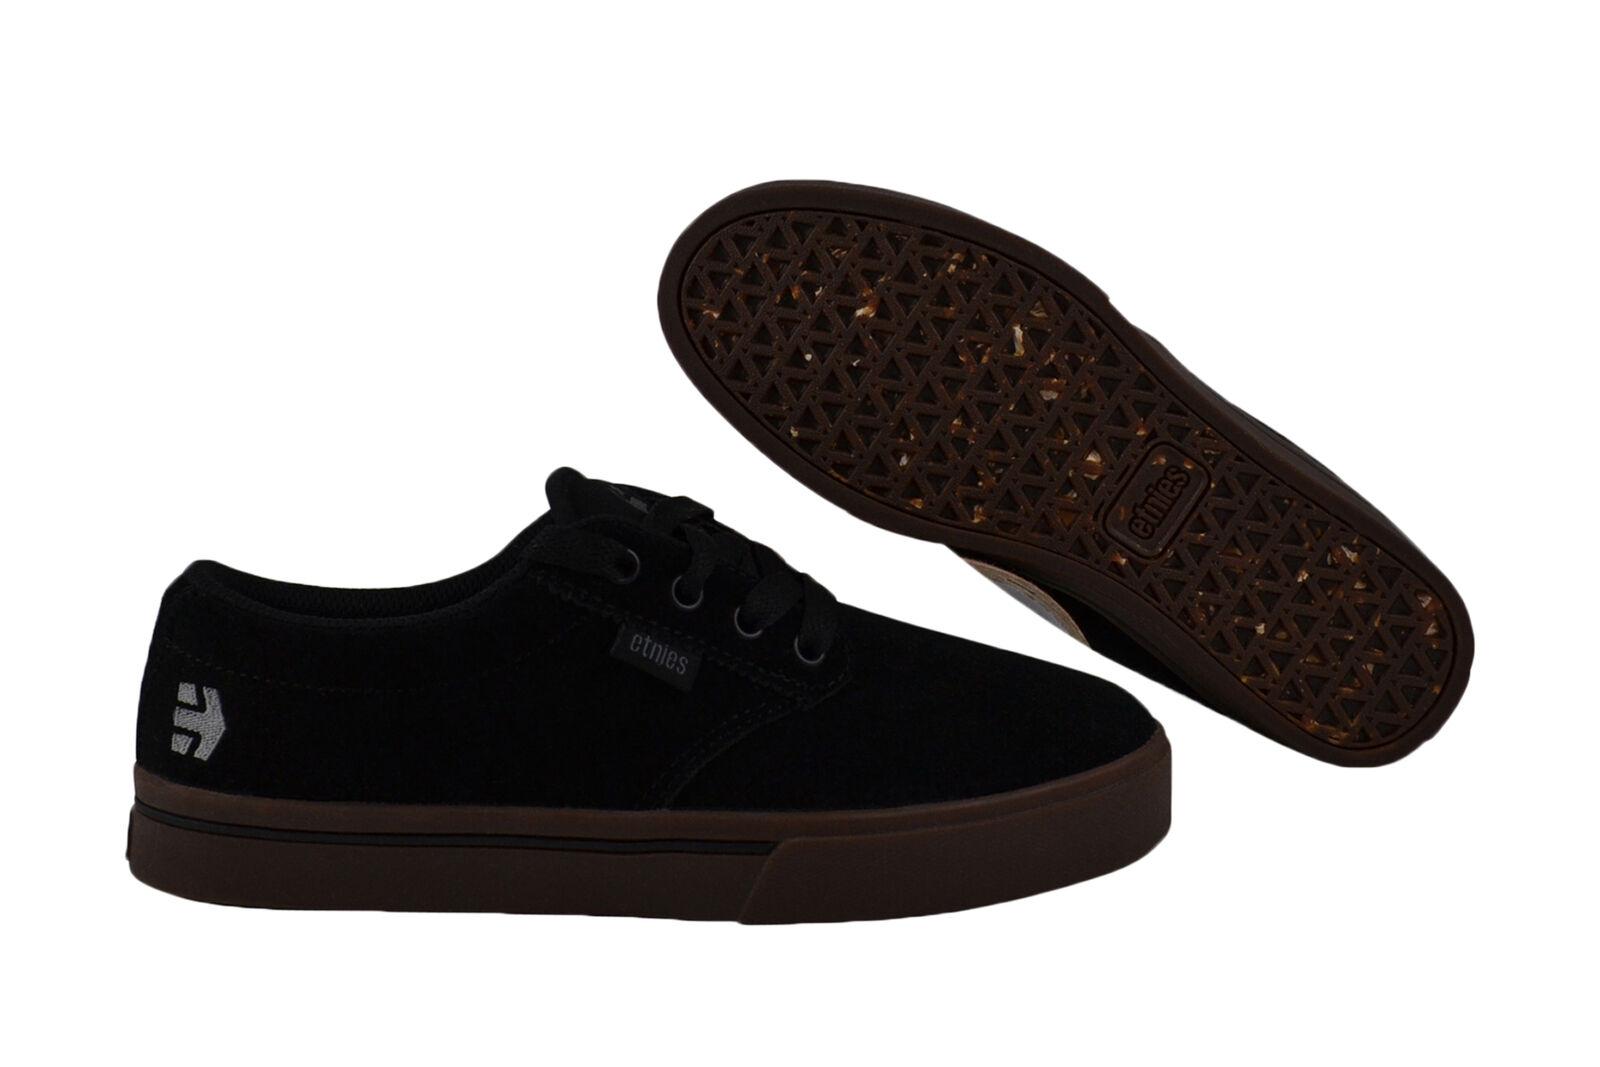 Etnies Jameson 2 ECO schwarz schwarz gum Skater Schuhe Turnschuhe schwarz